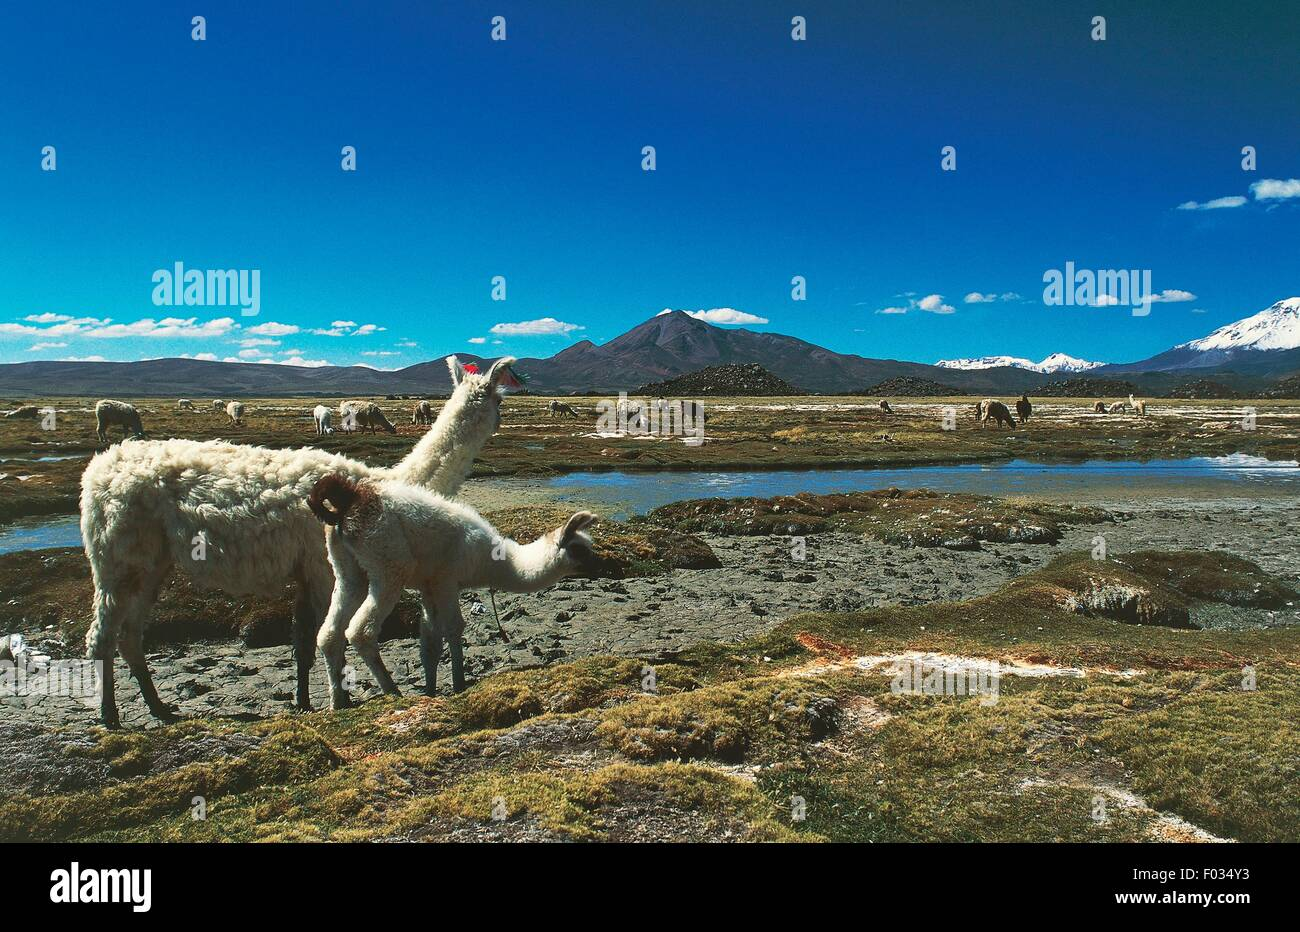 Guanacos (Lama guanicoe), Parinacota, Lauca National Park (UNESCO World Heritage List, 1981), Arica y Parinacota Stock Photo